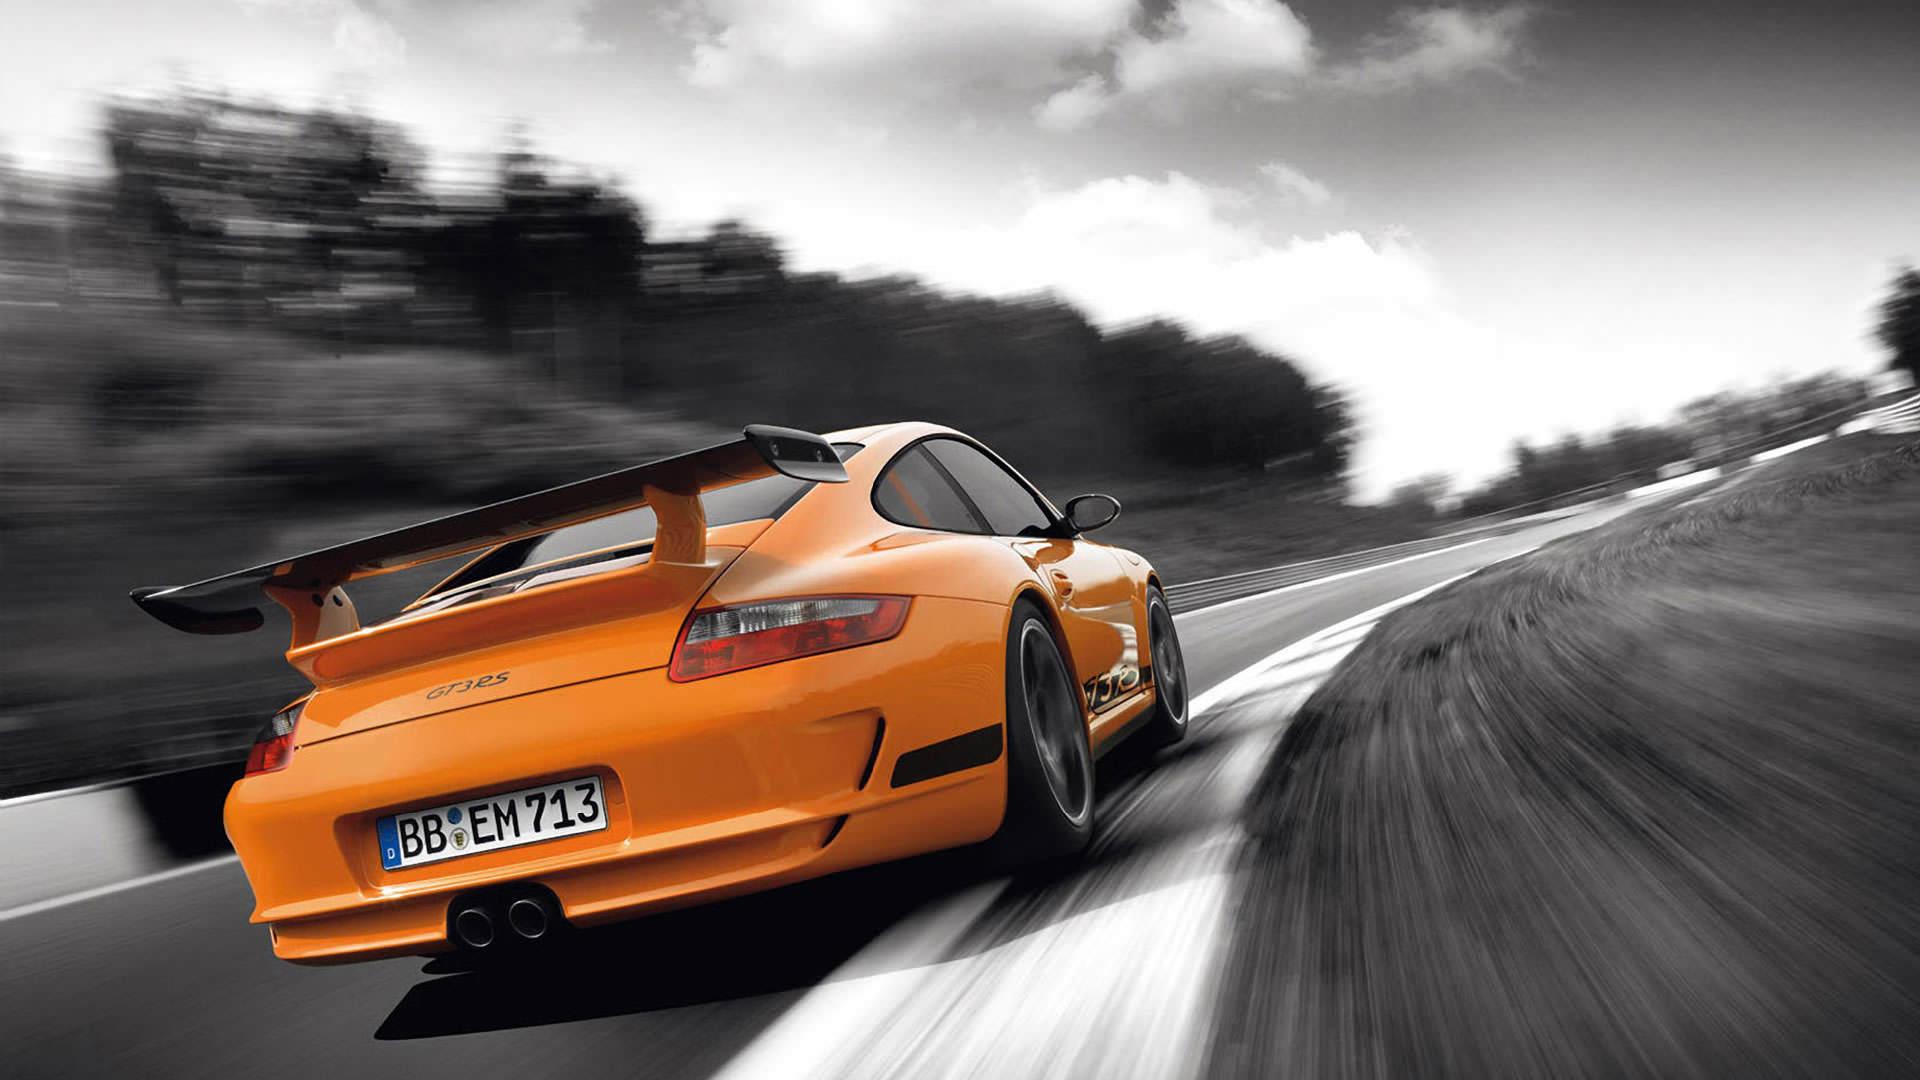 Porsche Yeni Sper HD Resimleri Hd Wallpapers 1920x1080